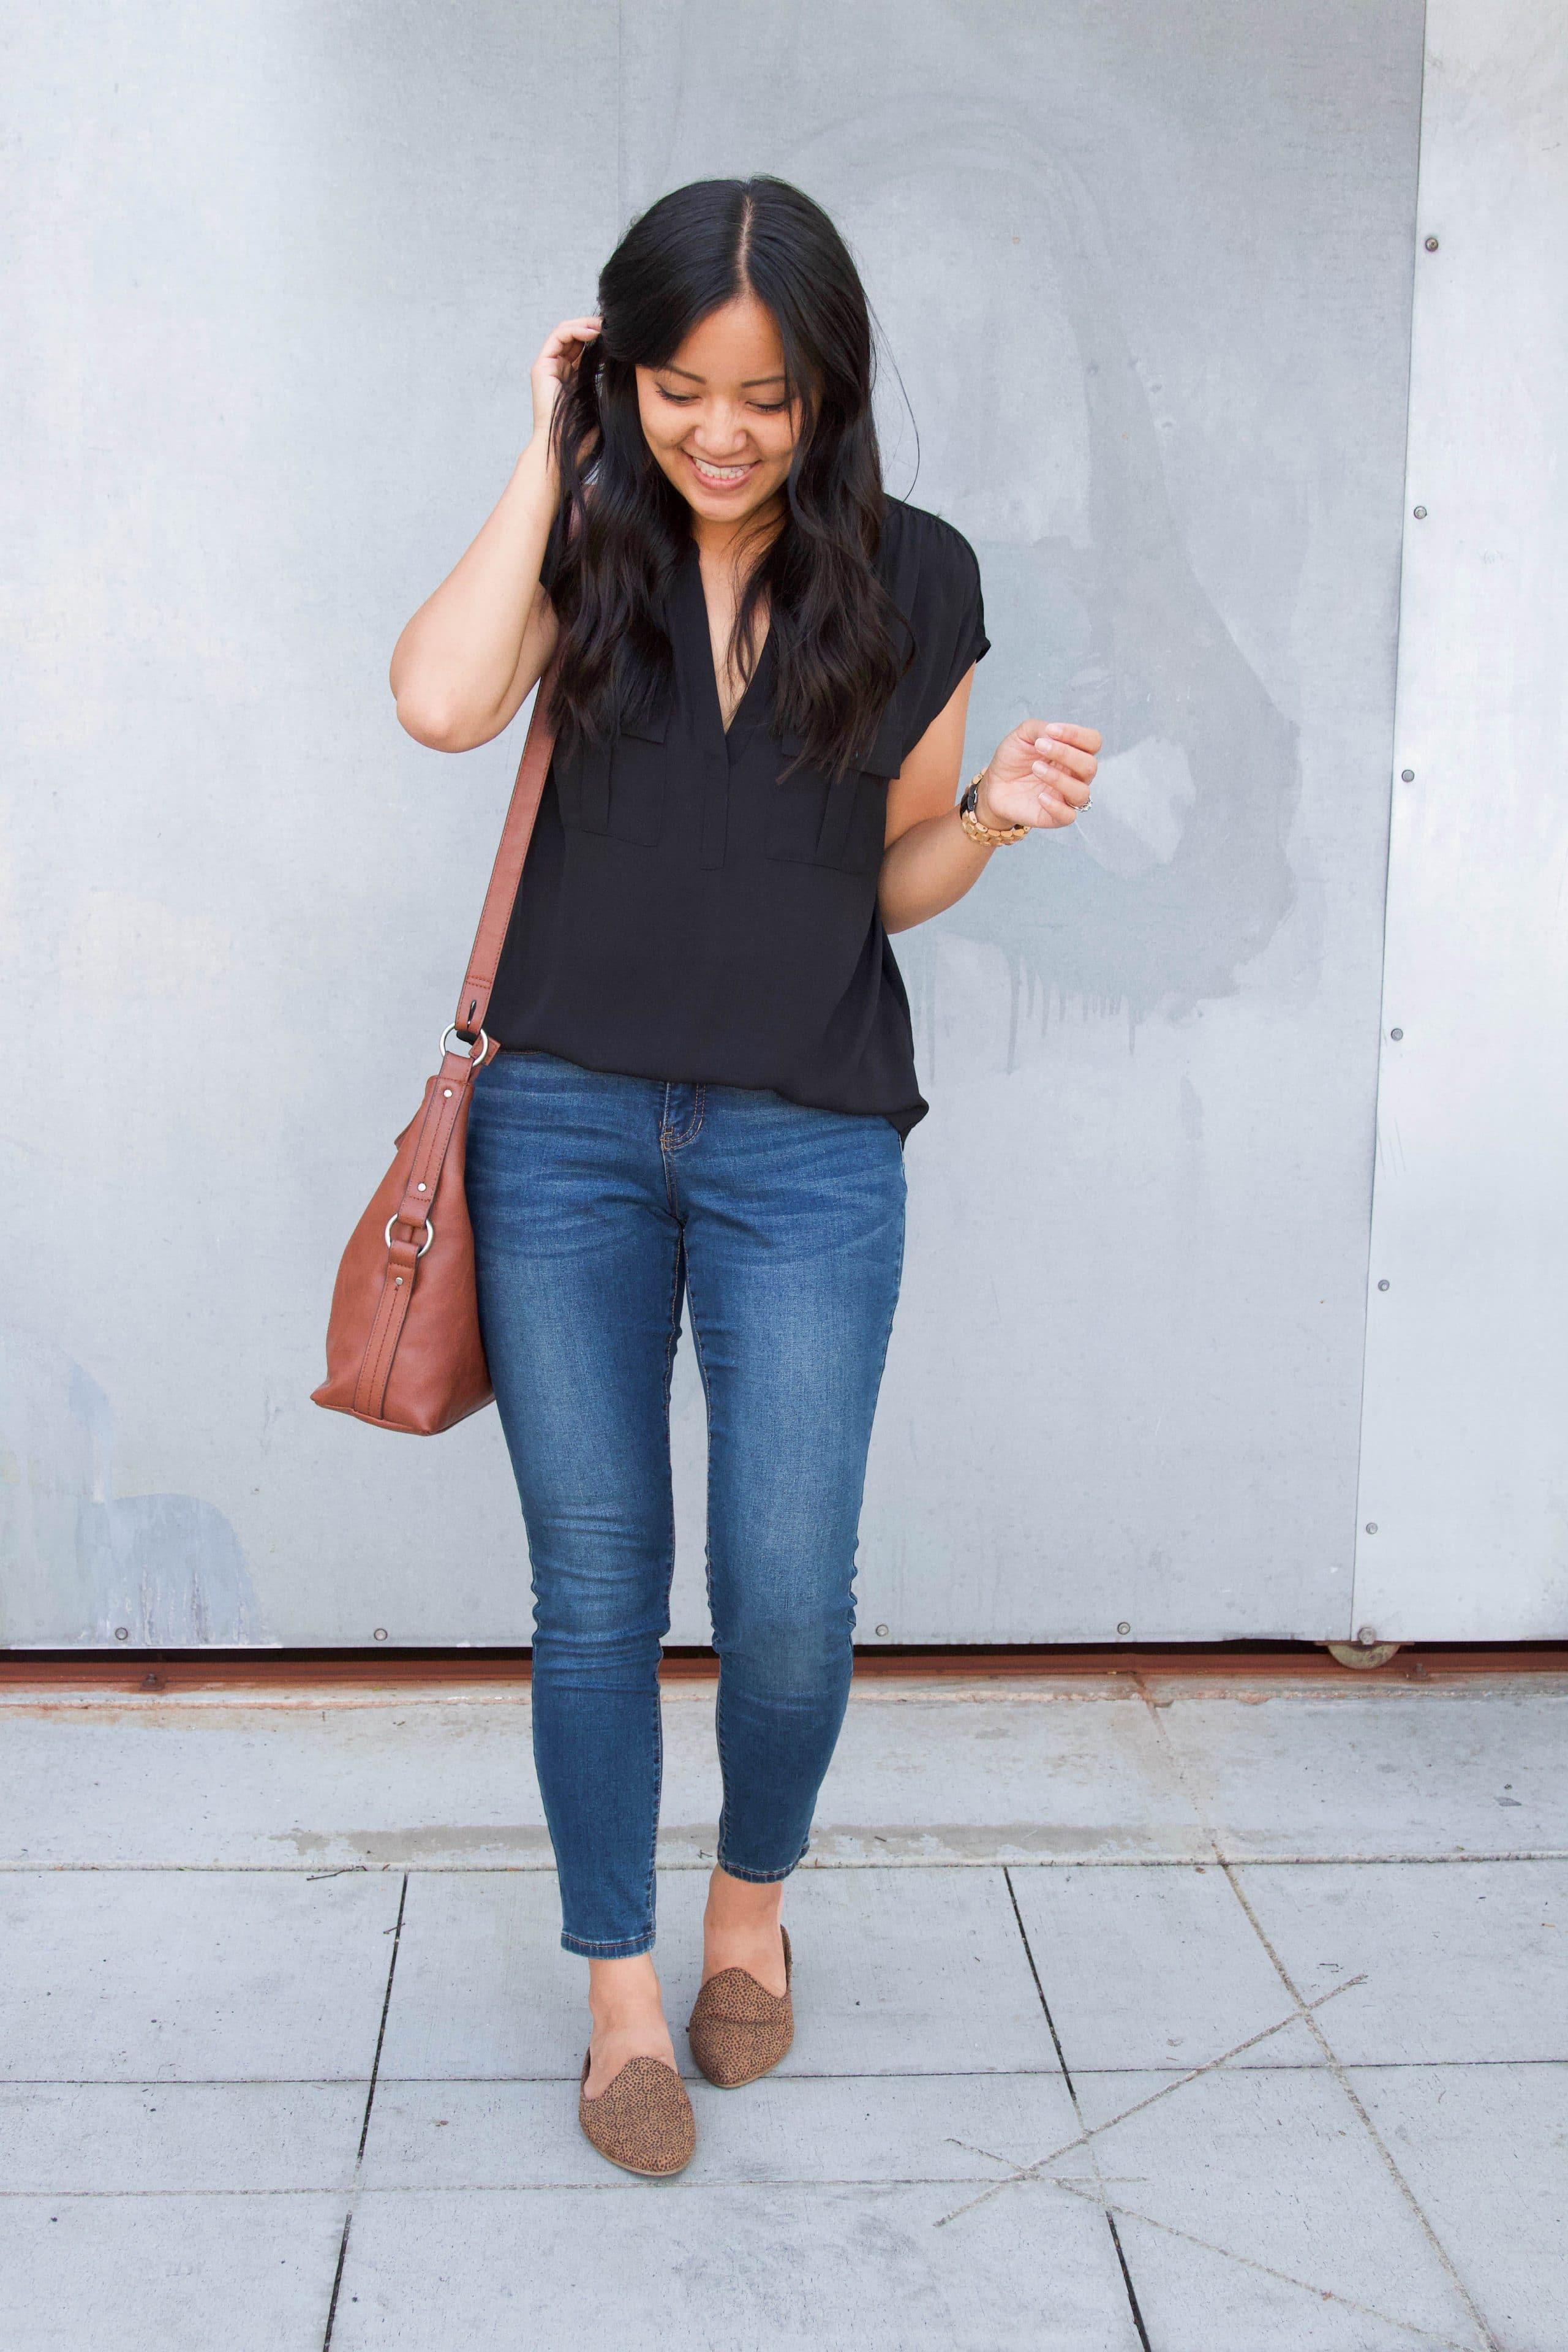 leopard mules + black top + skinny jeans + cognac purse